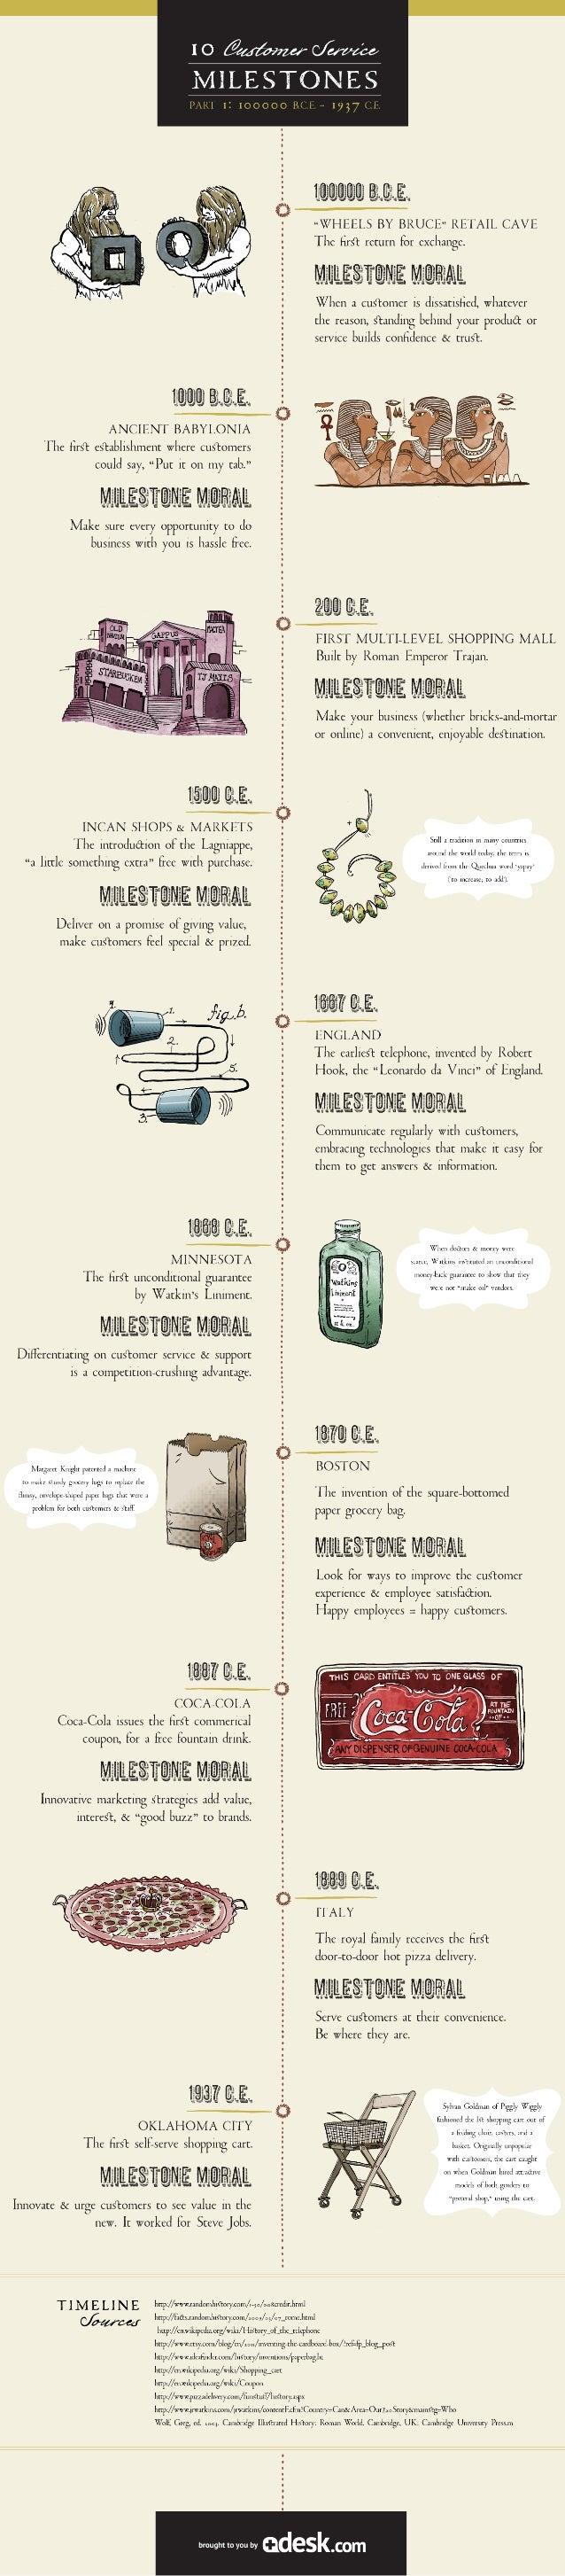 Customer Service Milestones: An Historical Timeline (100000 BCE-1937 CE)